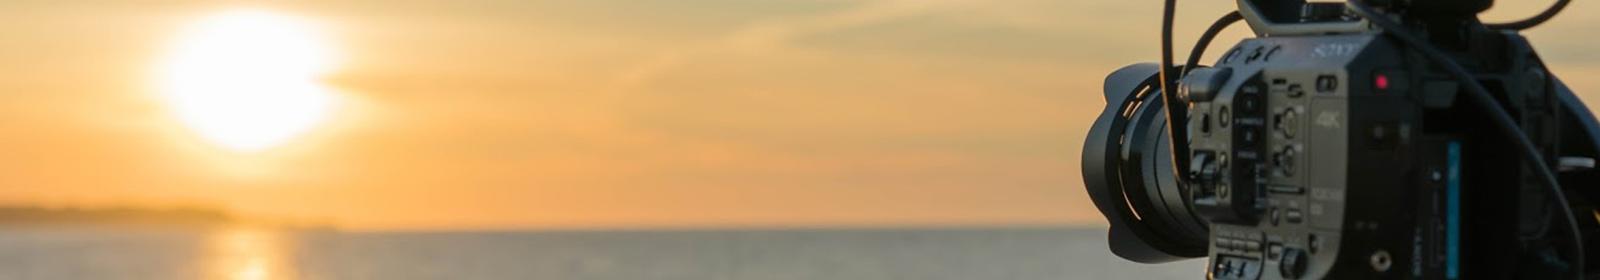 PRO-DITIONAL NIPPON 映像・写真展 旅とカメラ ~FS5とαシリーズで切り撮るニッポン~